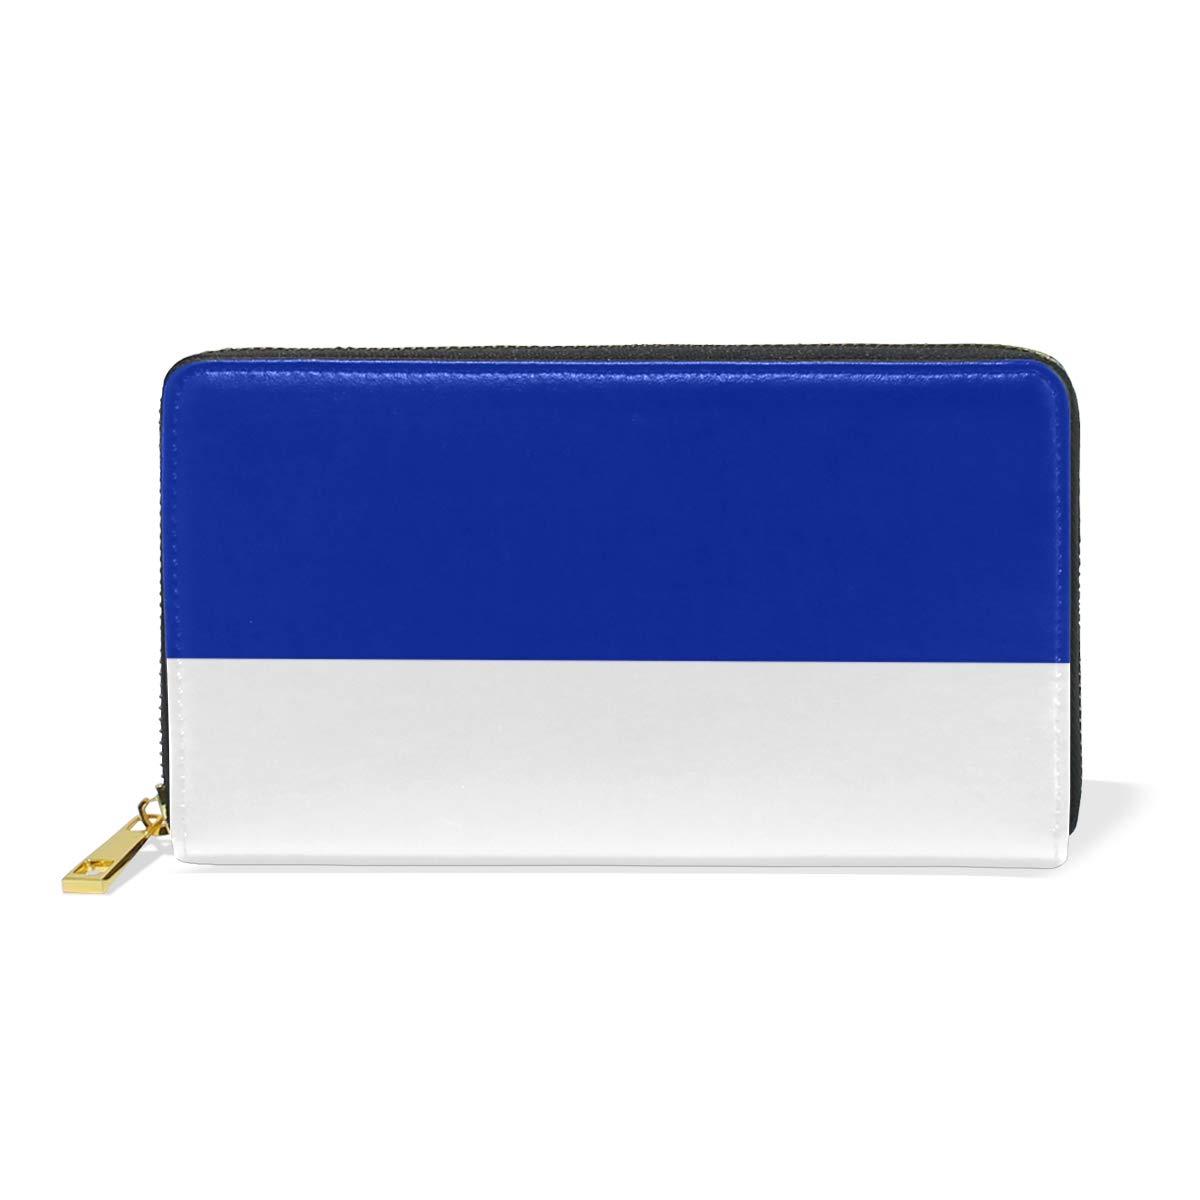 Slim Minimalist Leather Wallets For Women Men France Flag